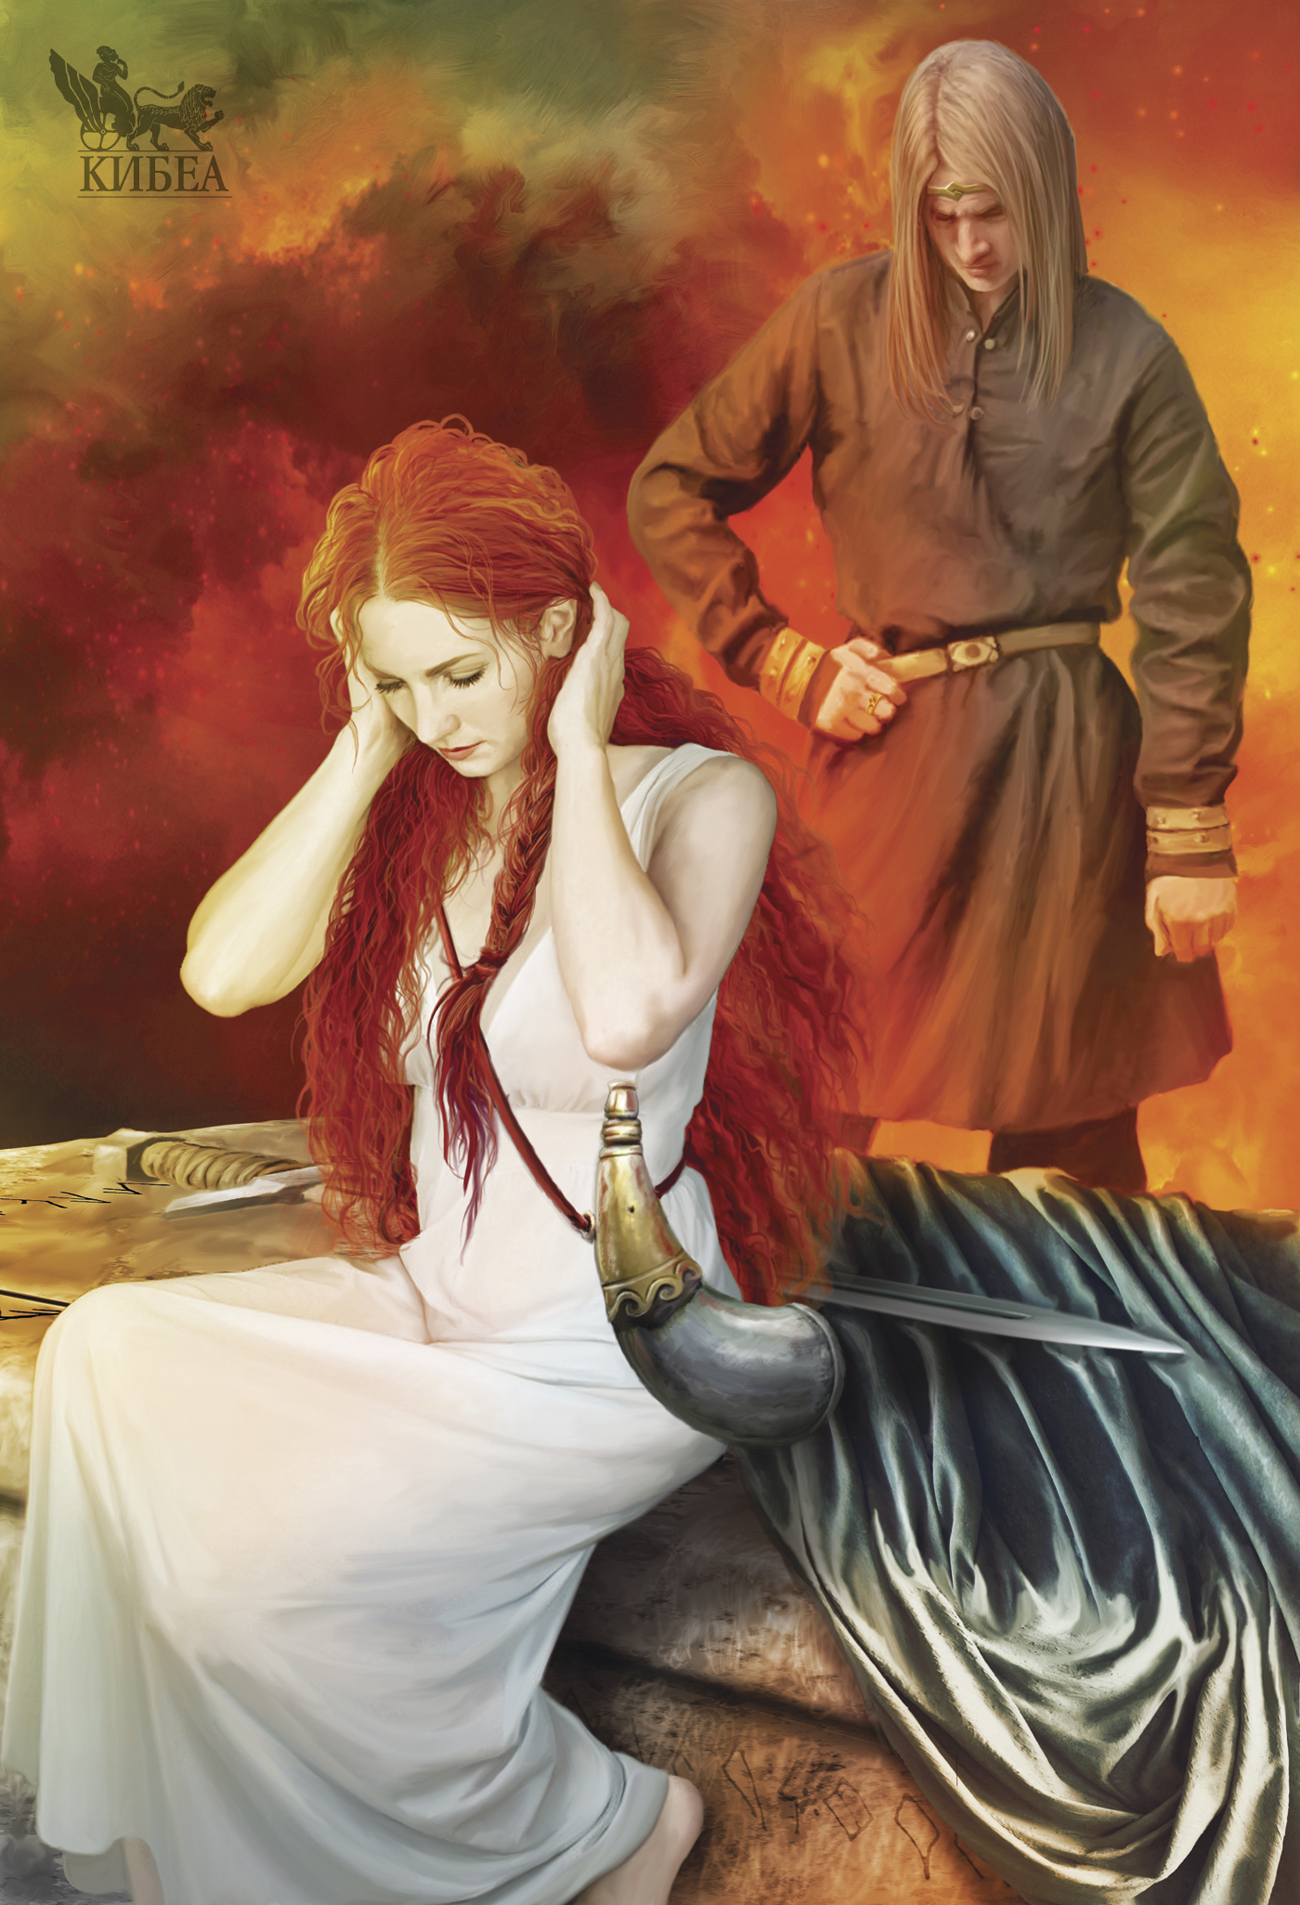 54p__Siegfrid-Gunter & Brunhilda - The Sword